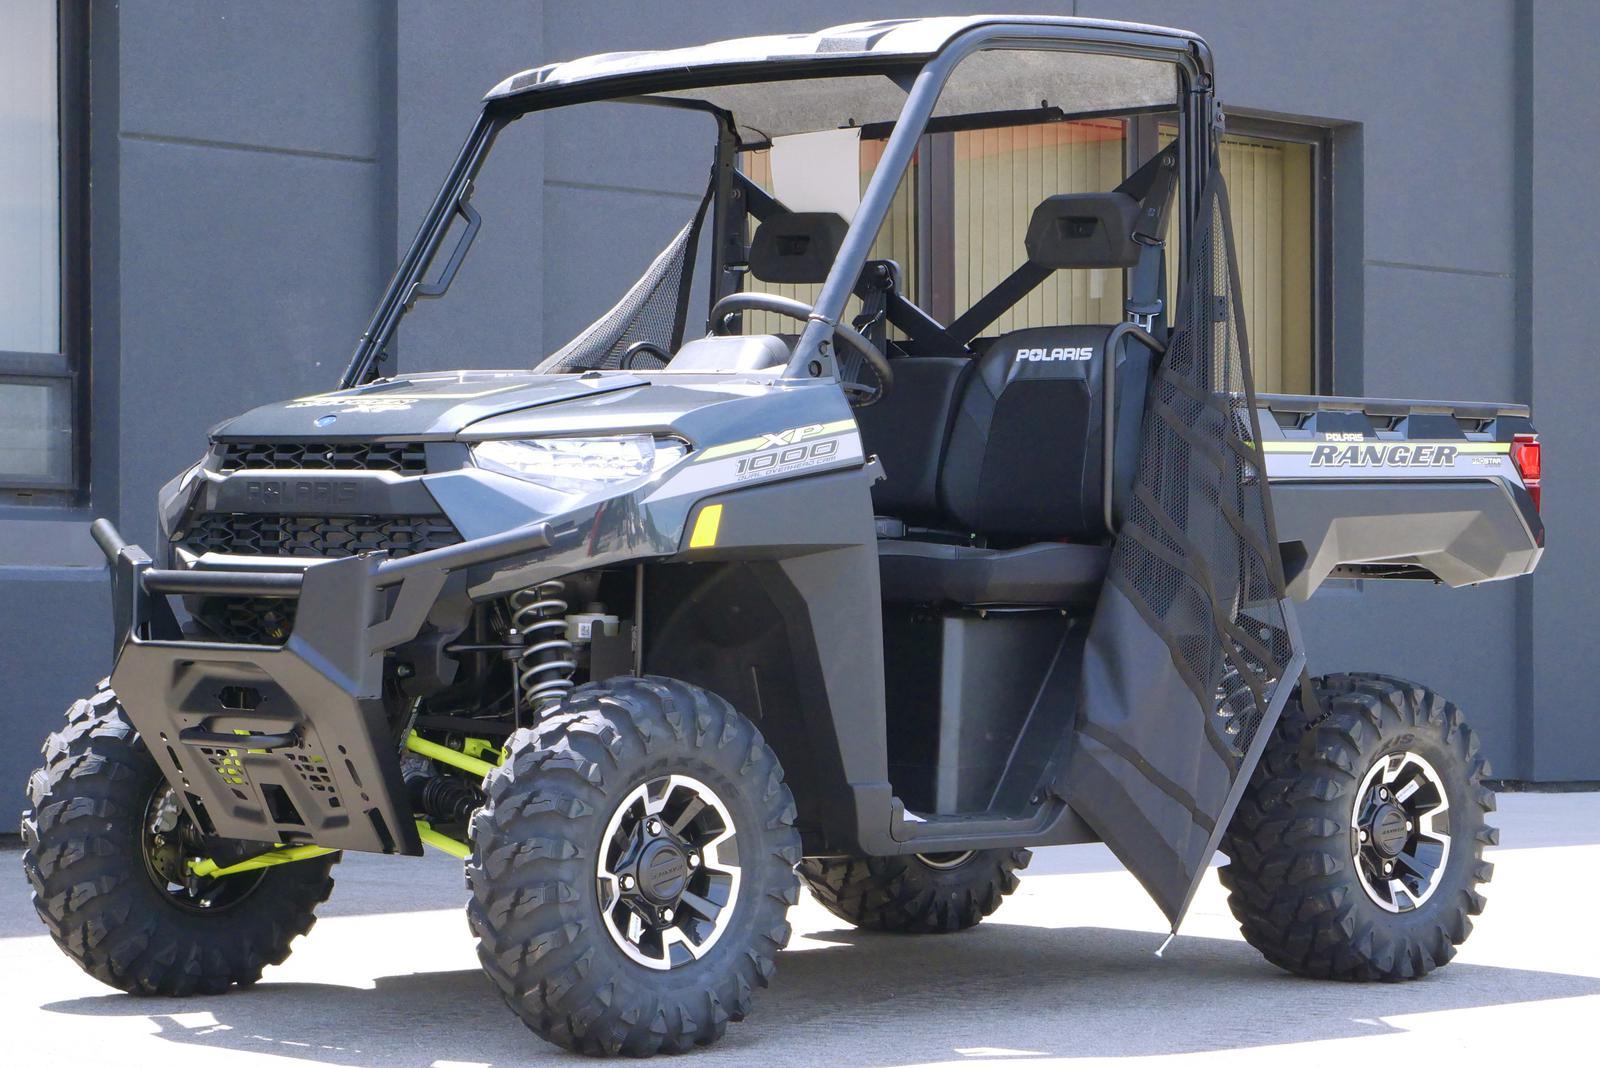 2019 Polaris Industries Ranger 1000 XP F&O Base - R19RRE99A